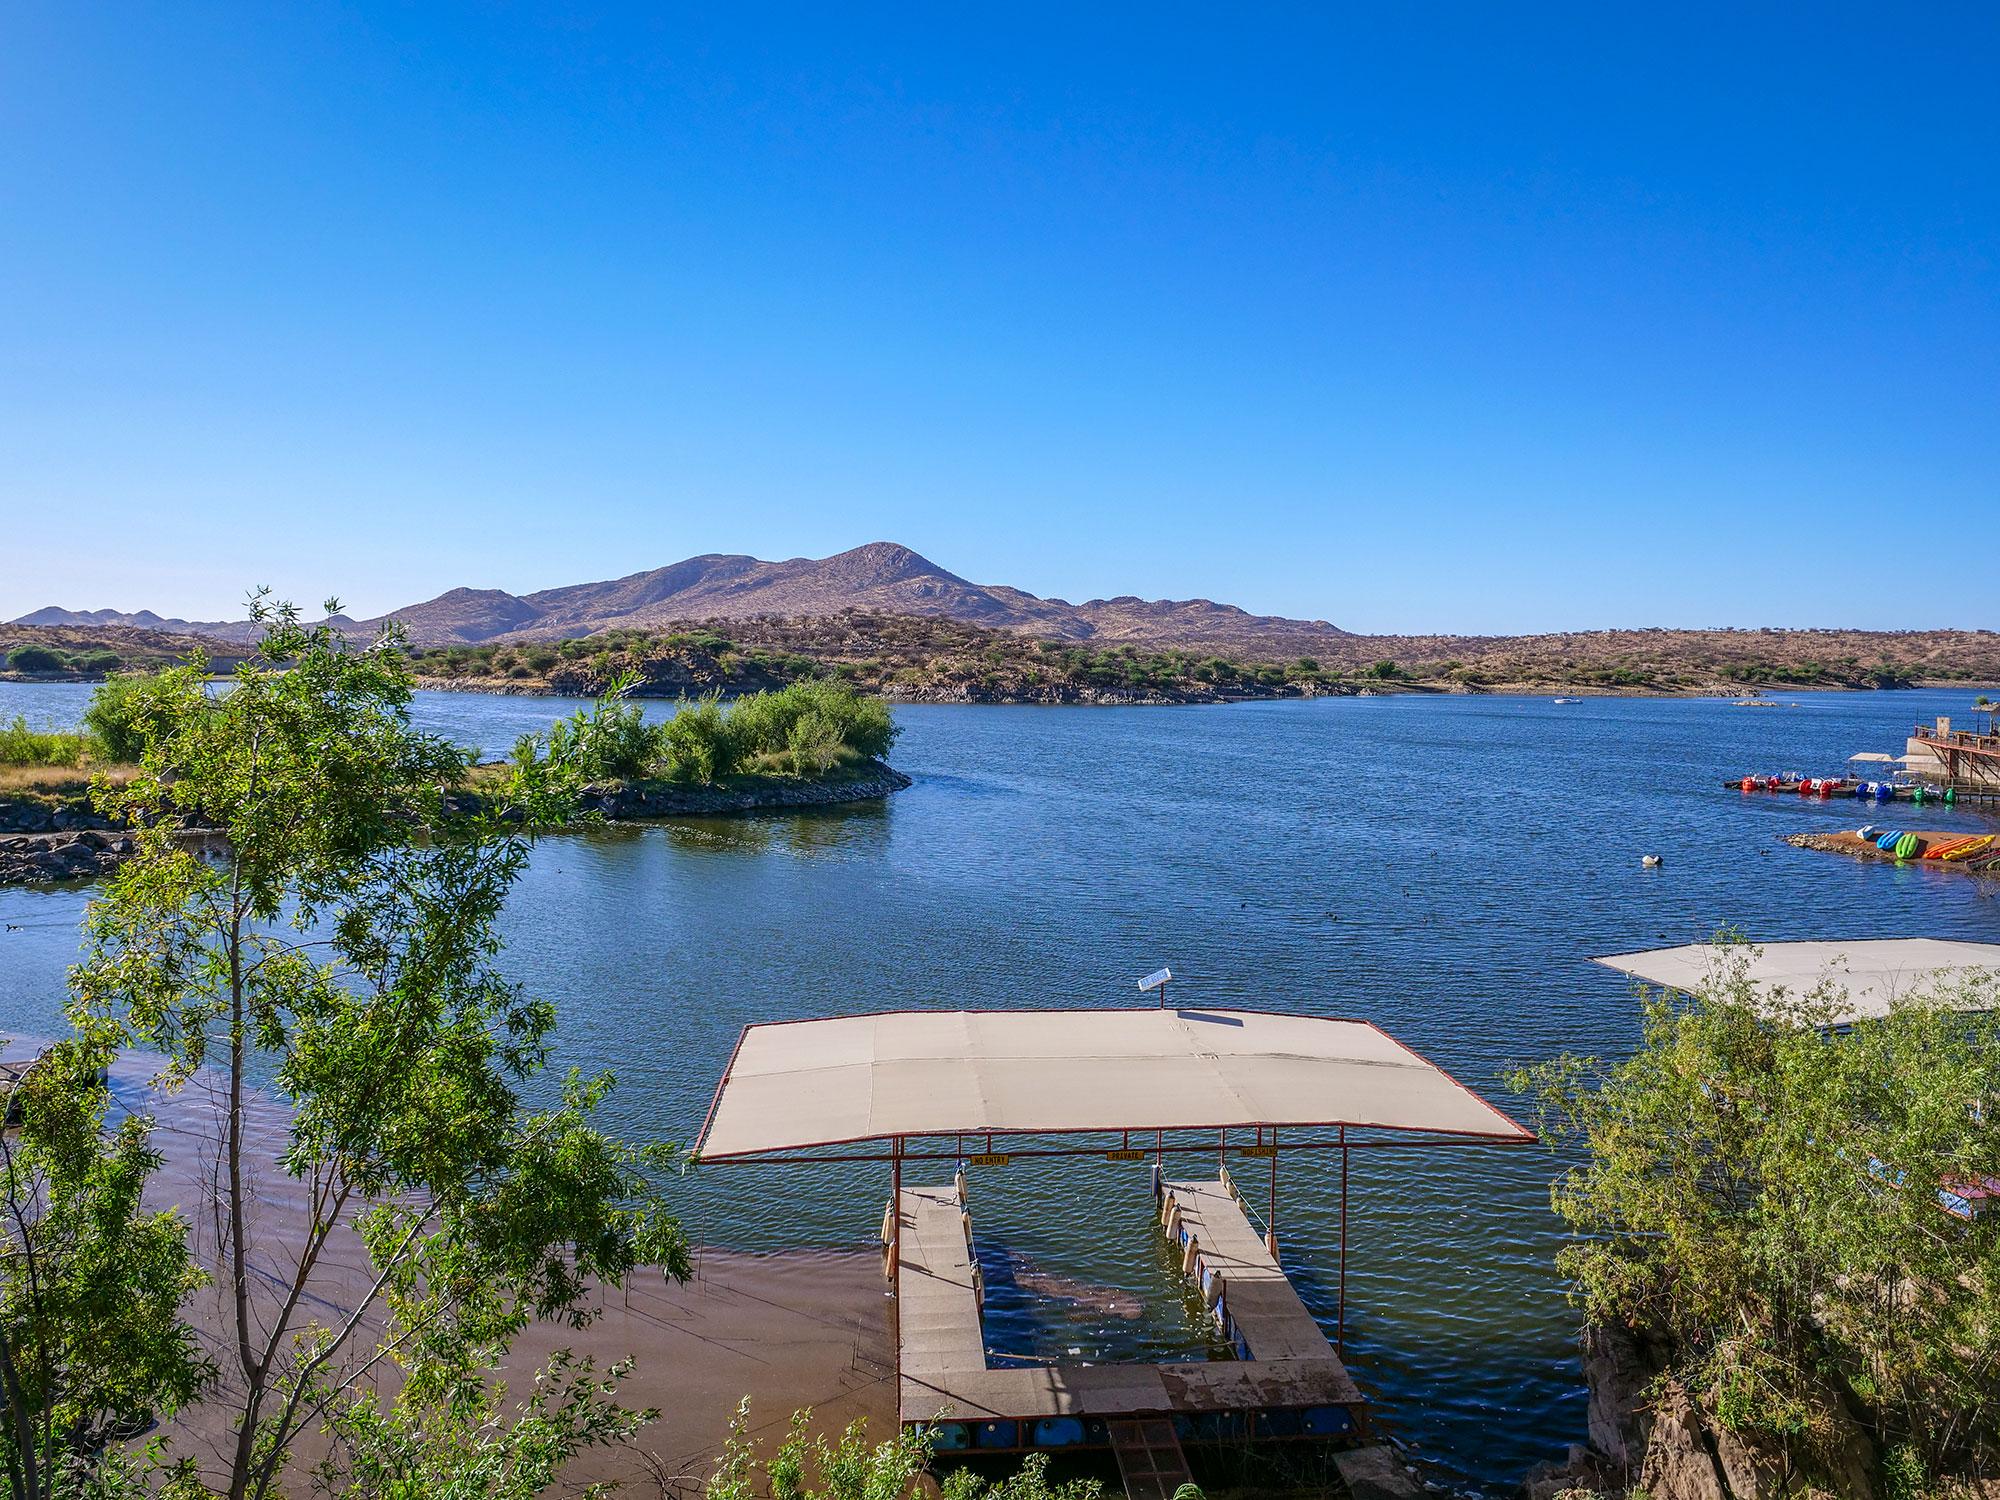 Lake Oanob Resort, Rehoboth, Namibia, Africa